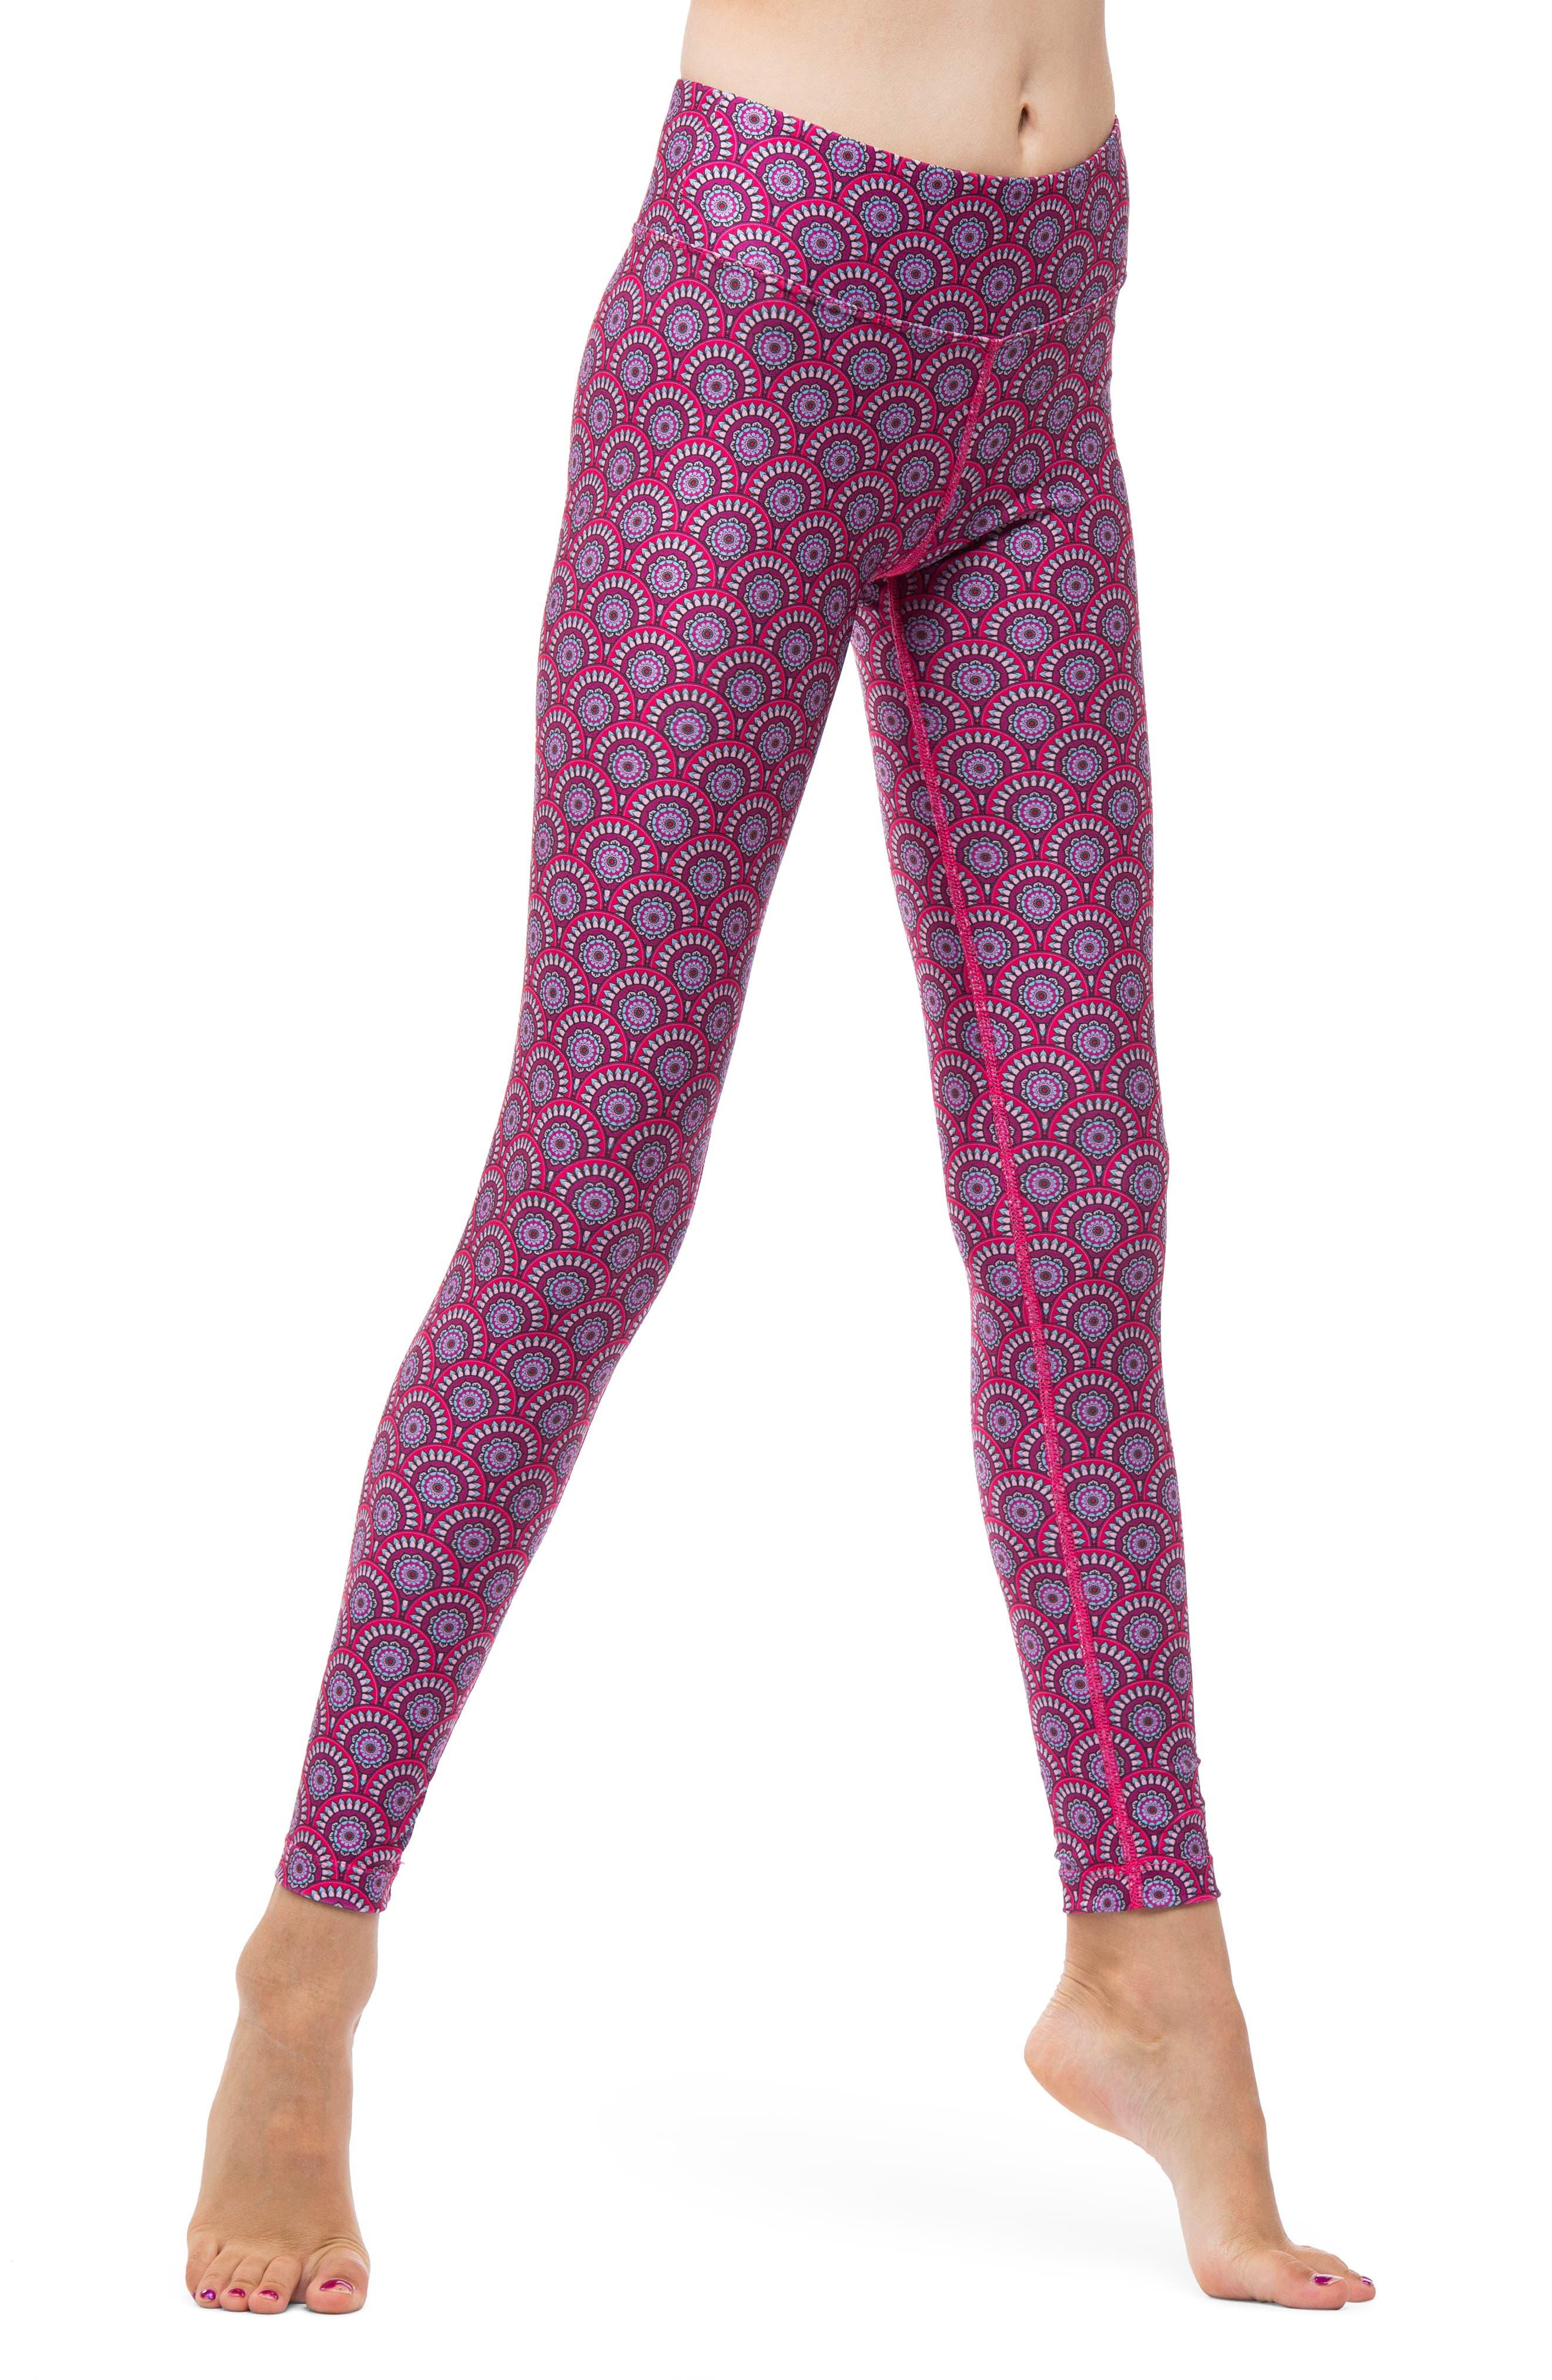 Mandala Leggings,                         Main,                         color, PINK MANDALA